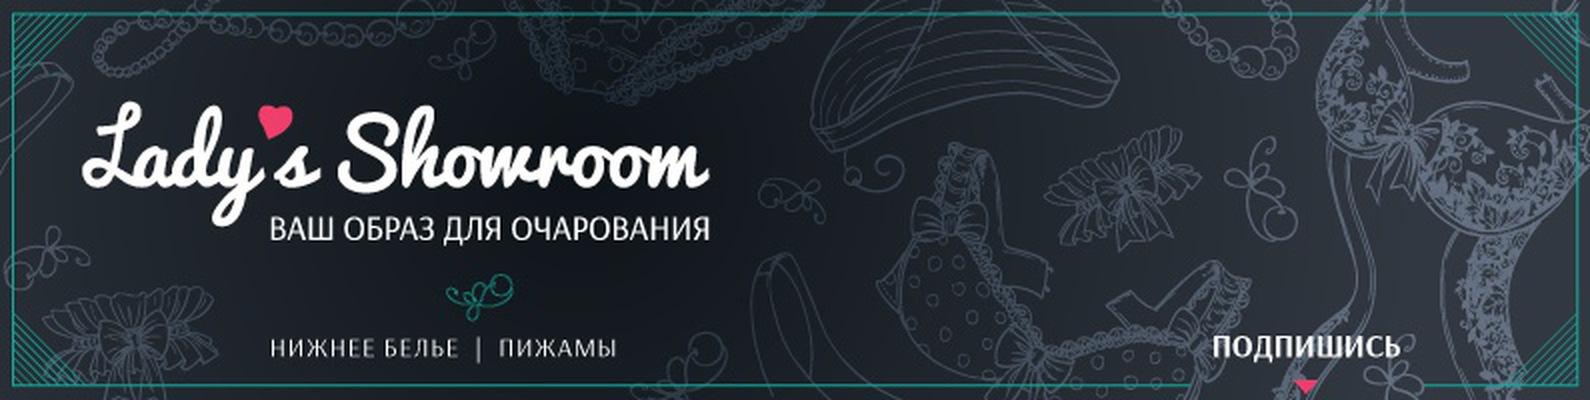 3ac6a85cfa83 Lady s Showroom - красивое нижнее белье   ВКонтакте